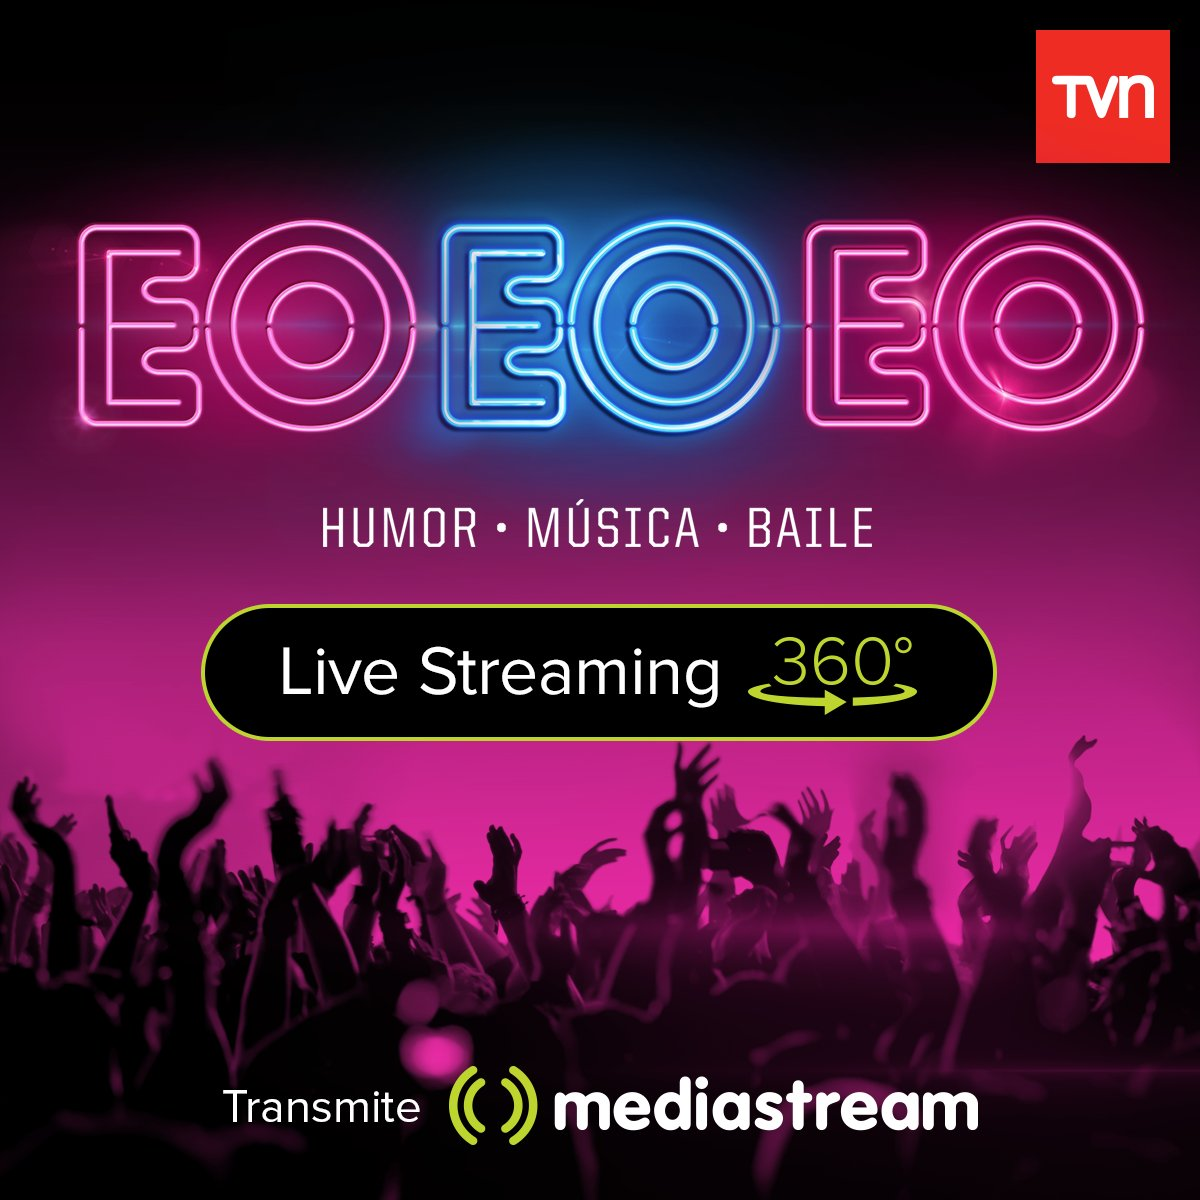 Entra ya y vive la experiencia Live 360º de EO EO EO en TVN https://t.co/PZUhXB1K9l #tvn #eoeoeo #mediastream360 https://t.co/TvJQGdV9HG